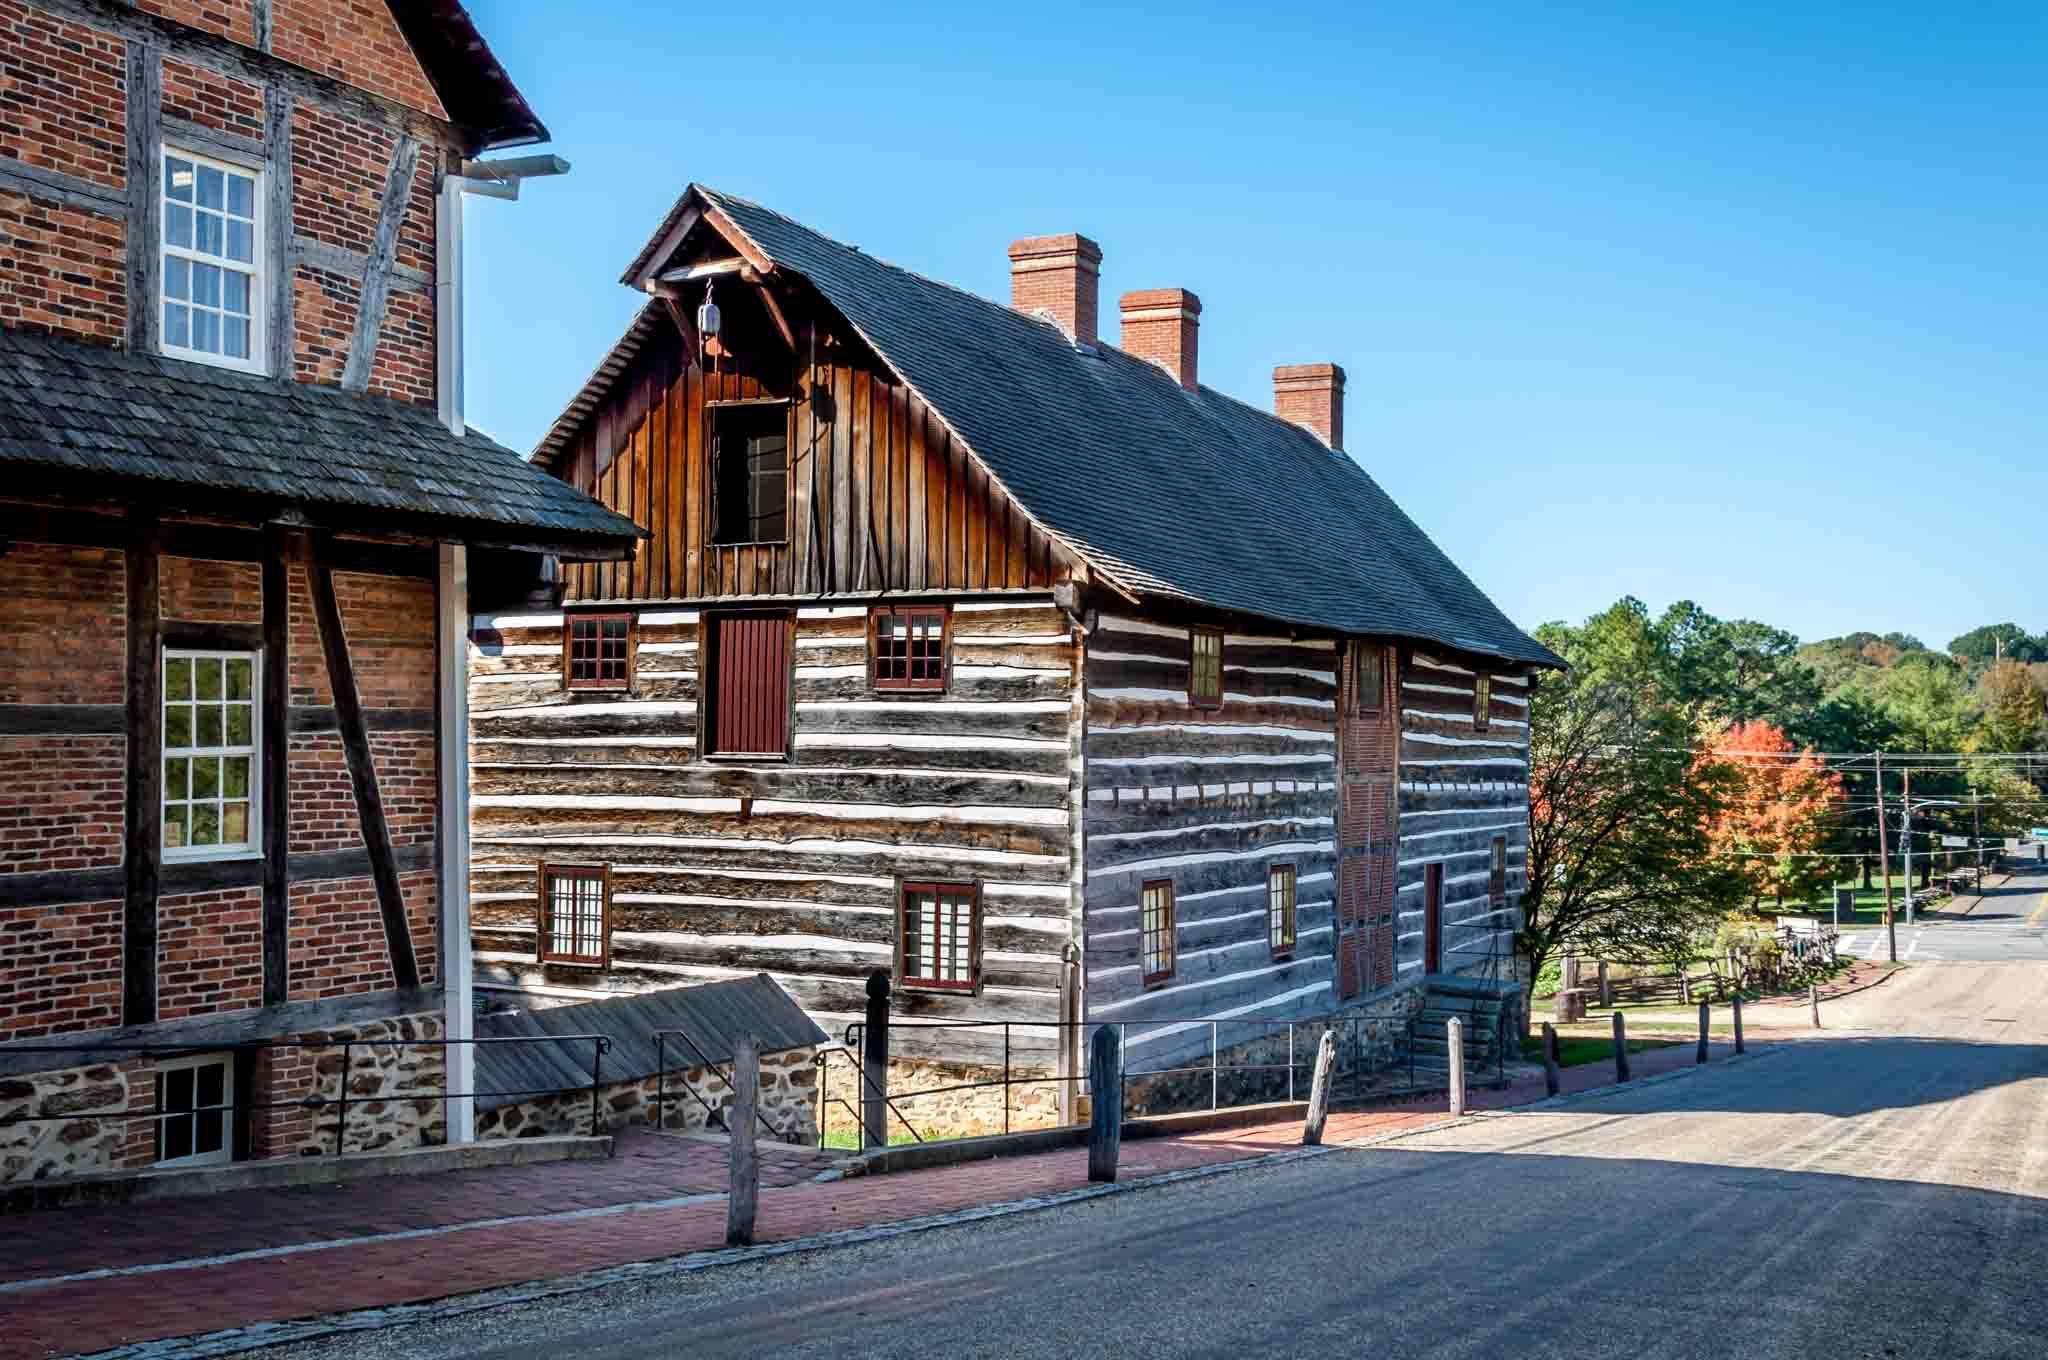 Historic building at Old Salem North Carolina